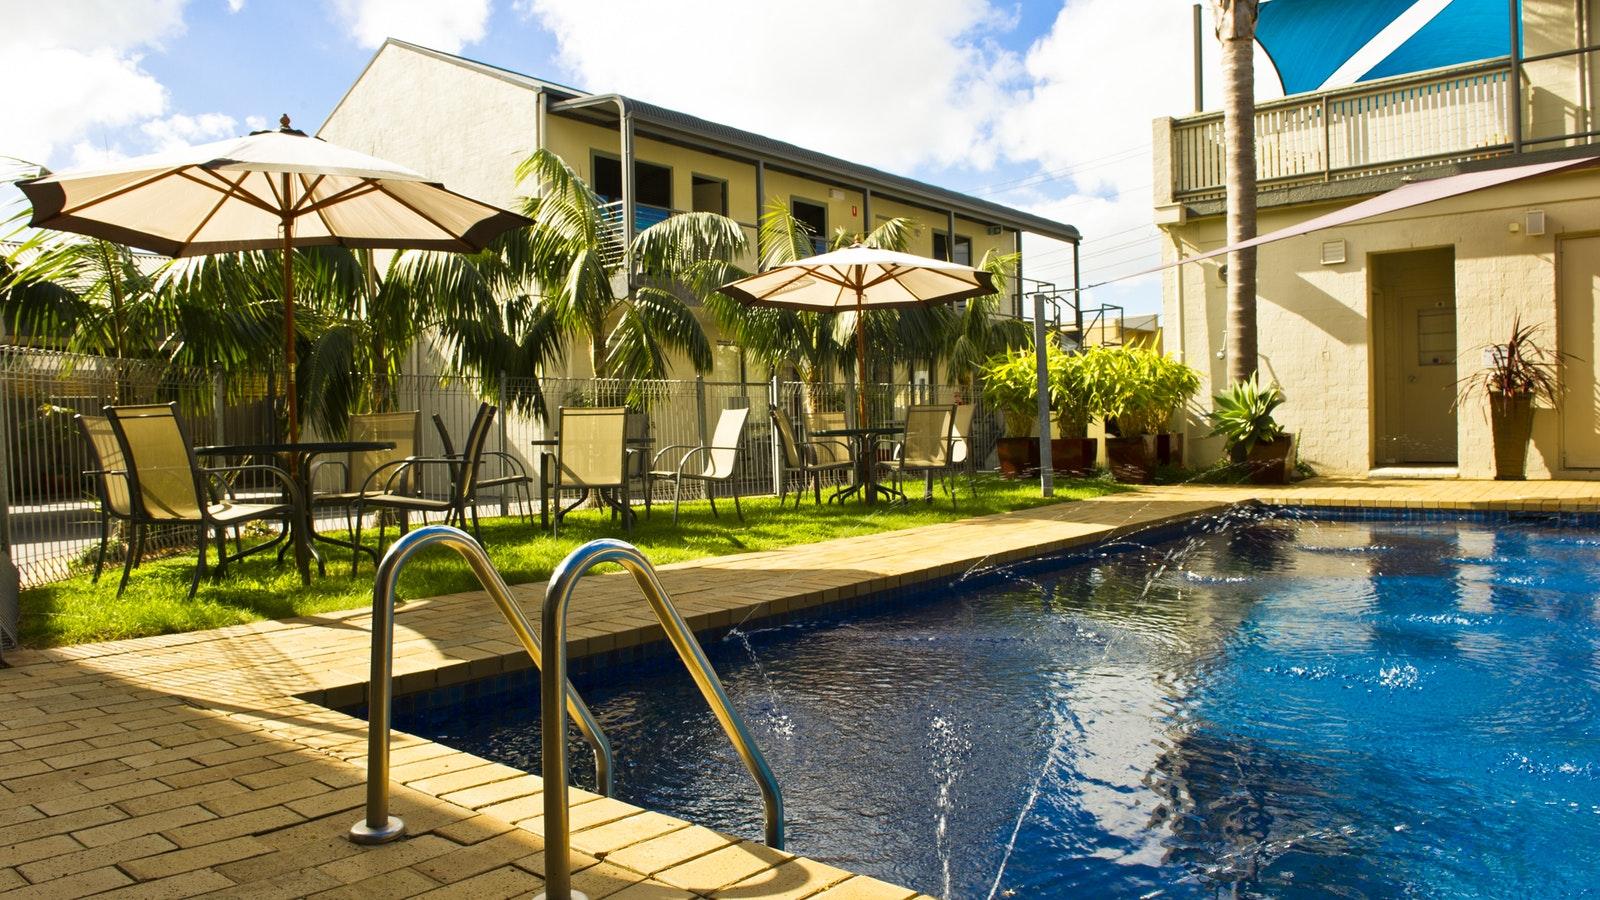 Pool heated November - April